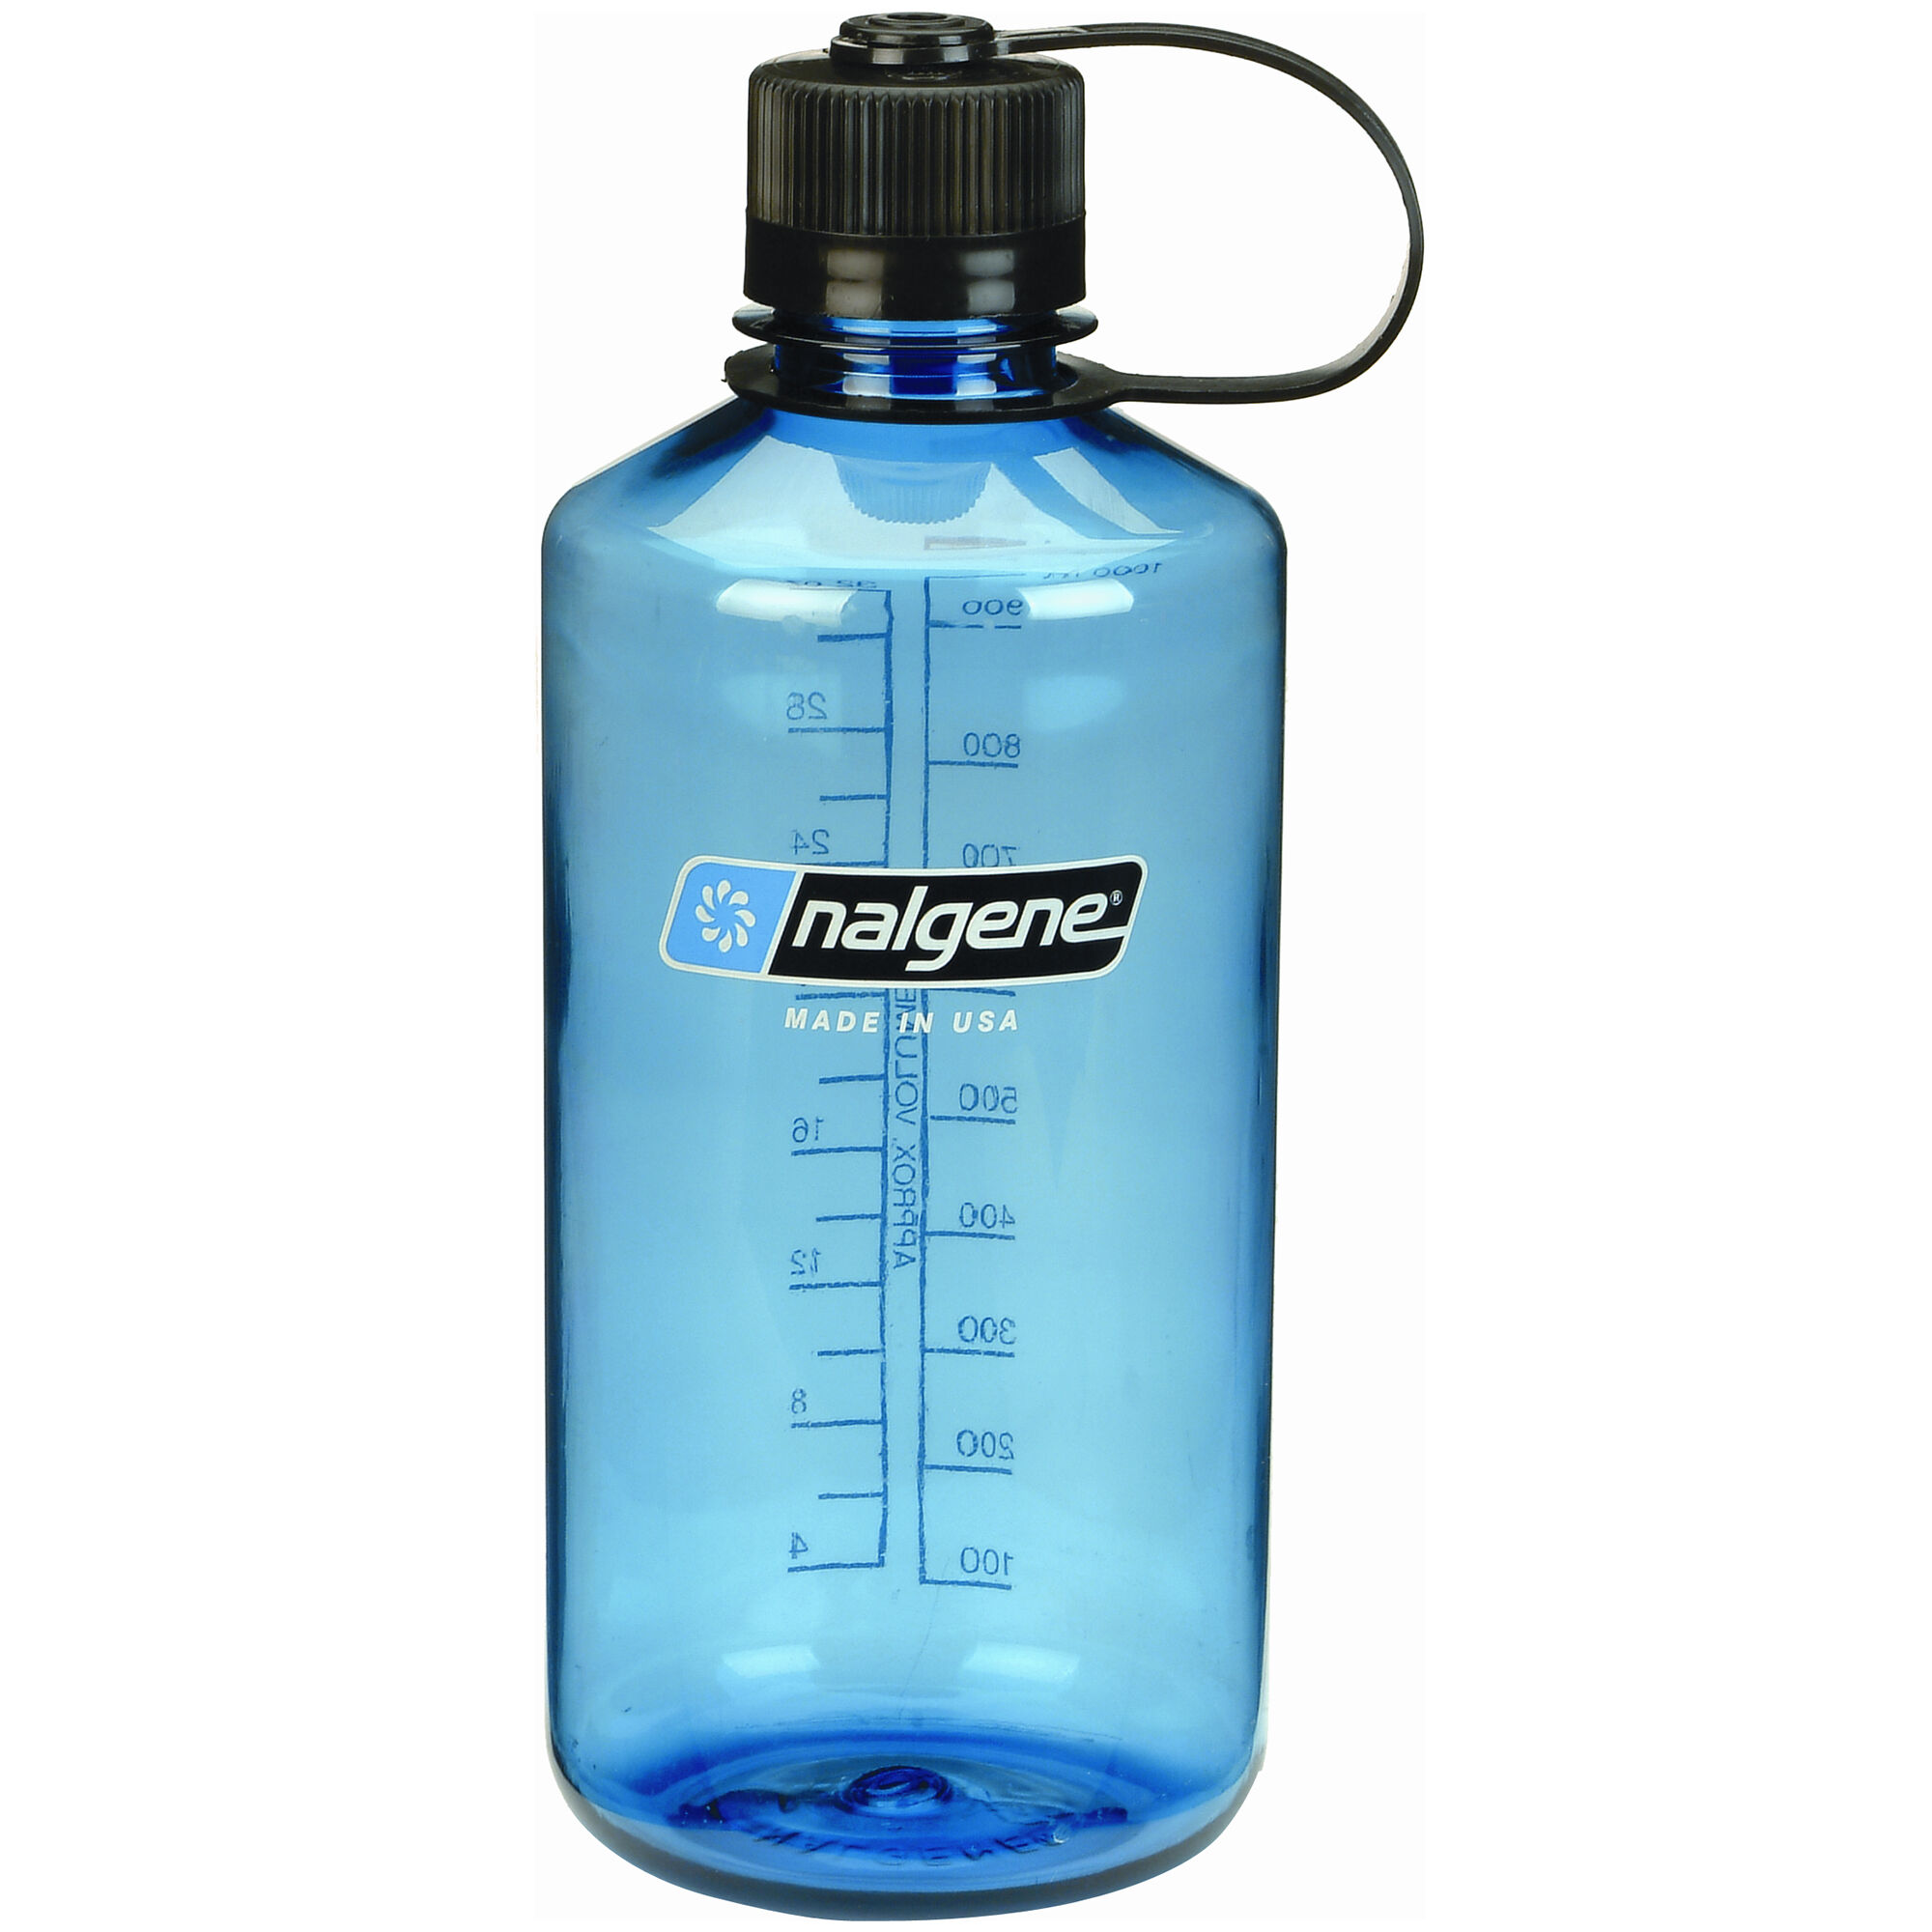 Nalgene Narrow Mouth Water Bottle 32oz Slate Blue